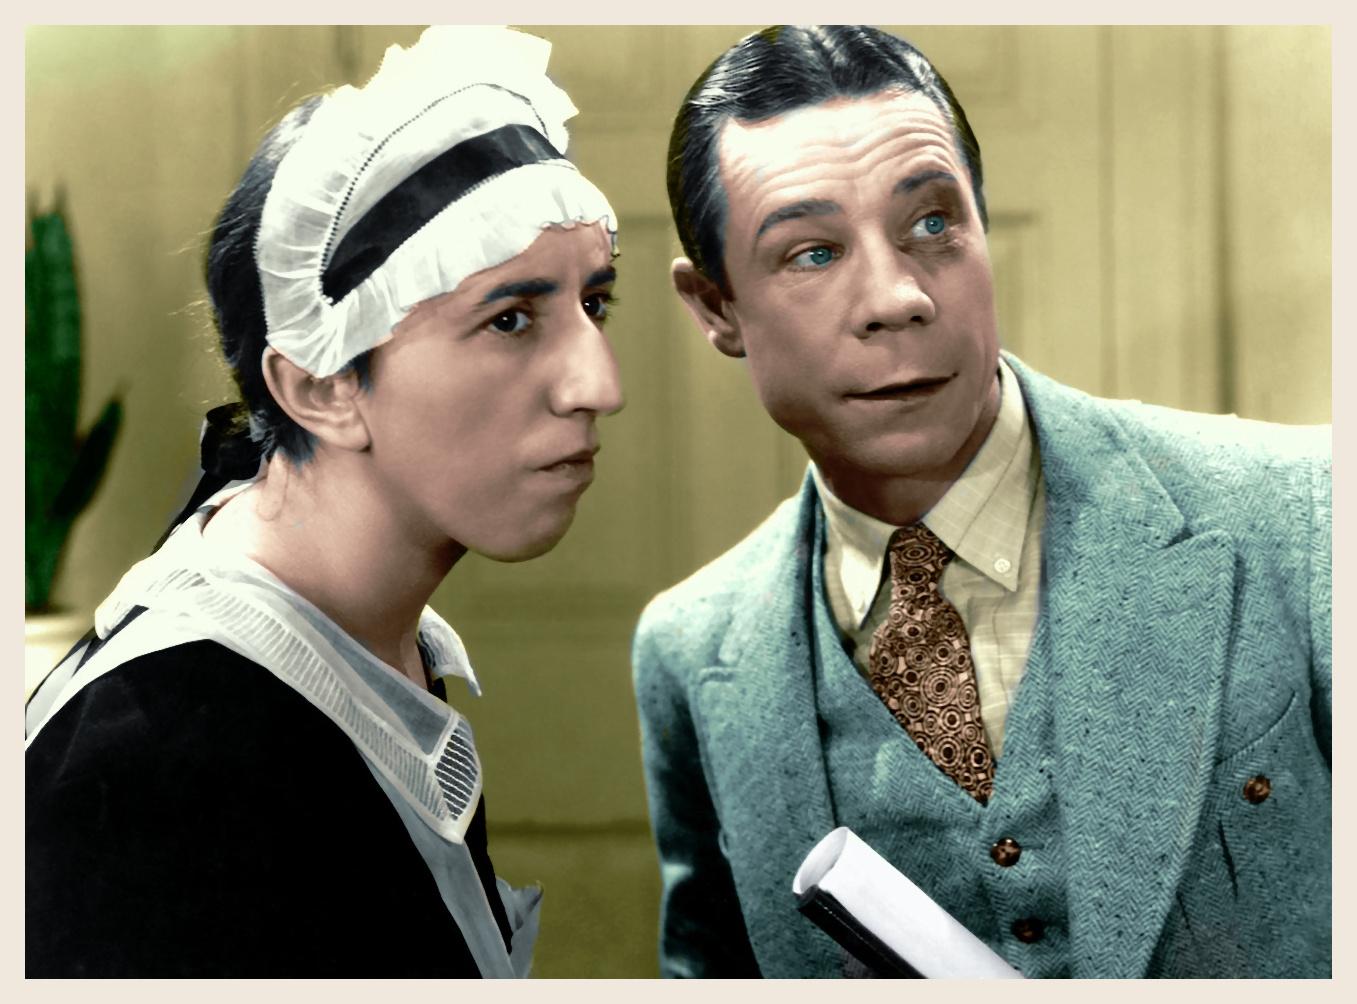 Margaret Hamilton and Joe E. Brown in When's Your Birthday? (1937)